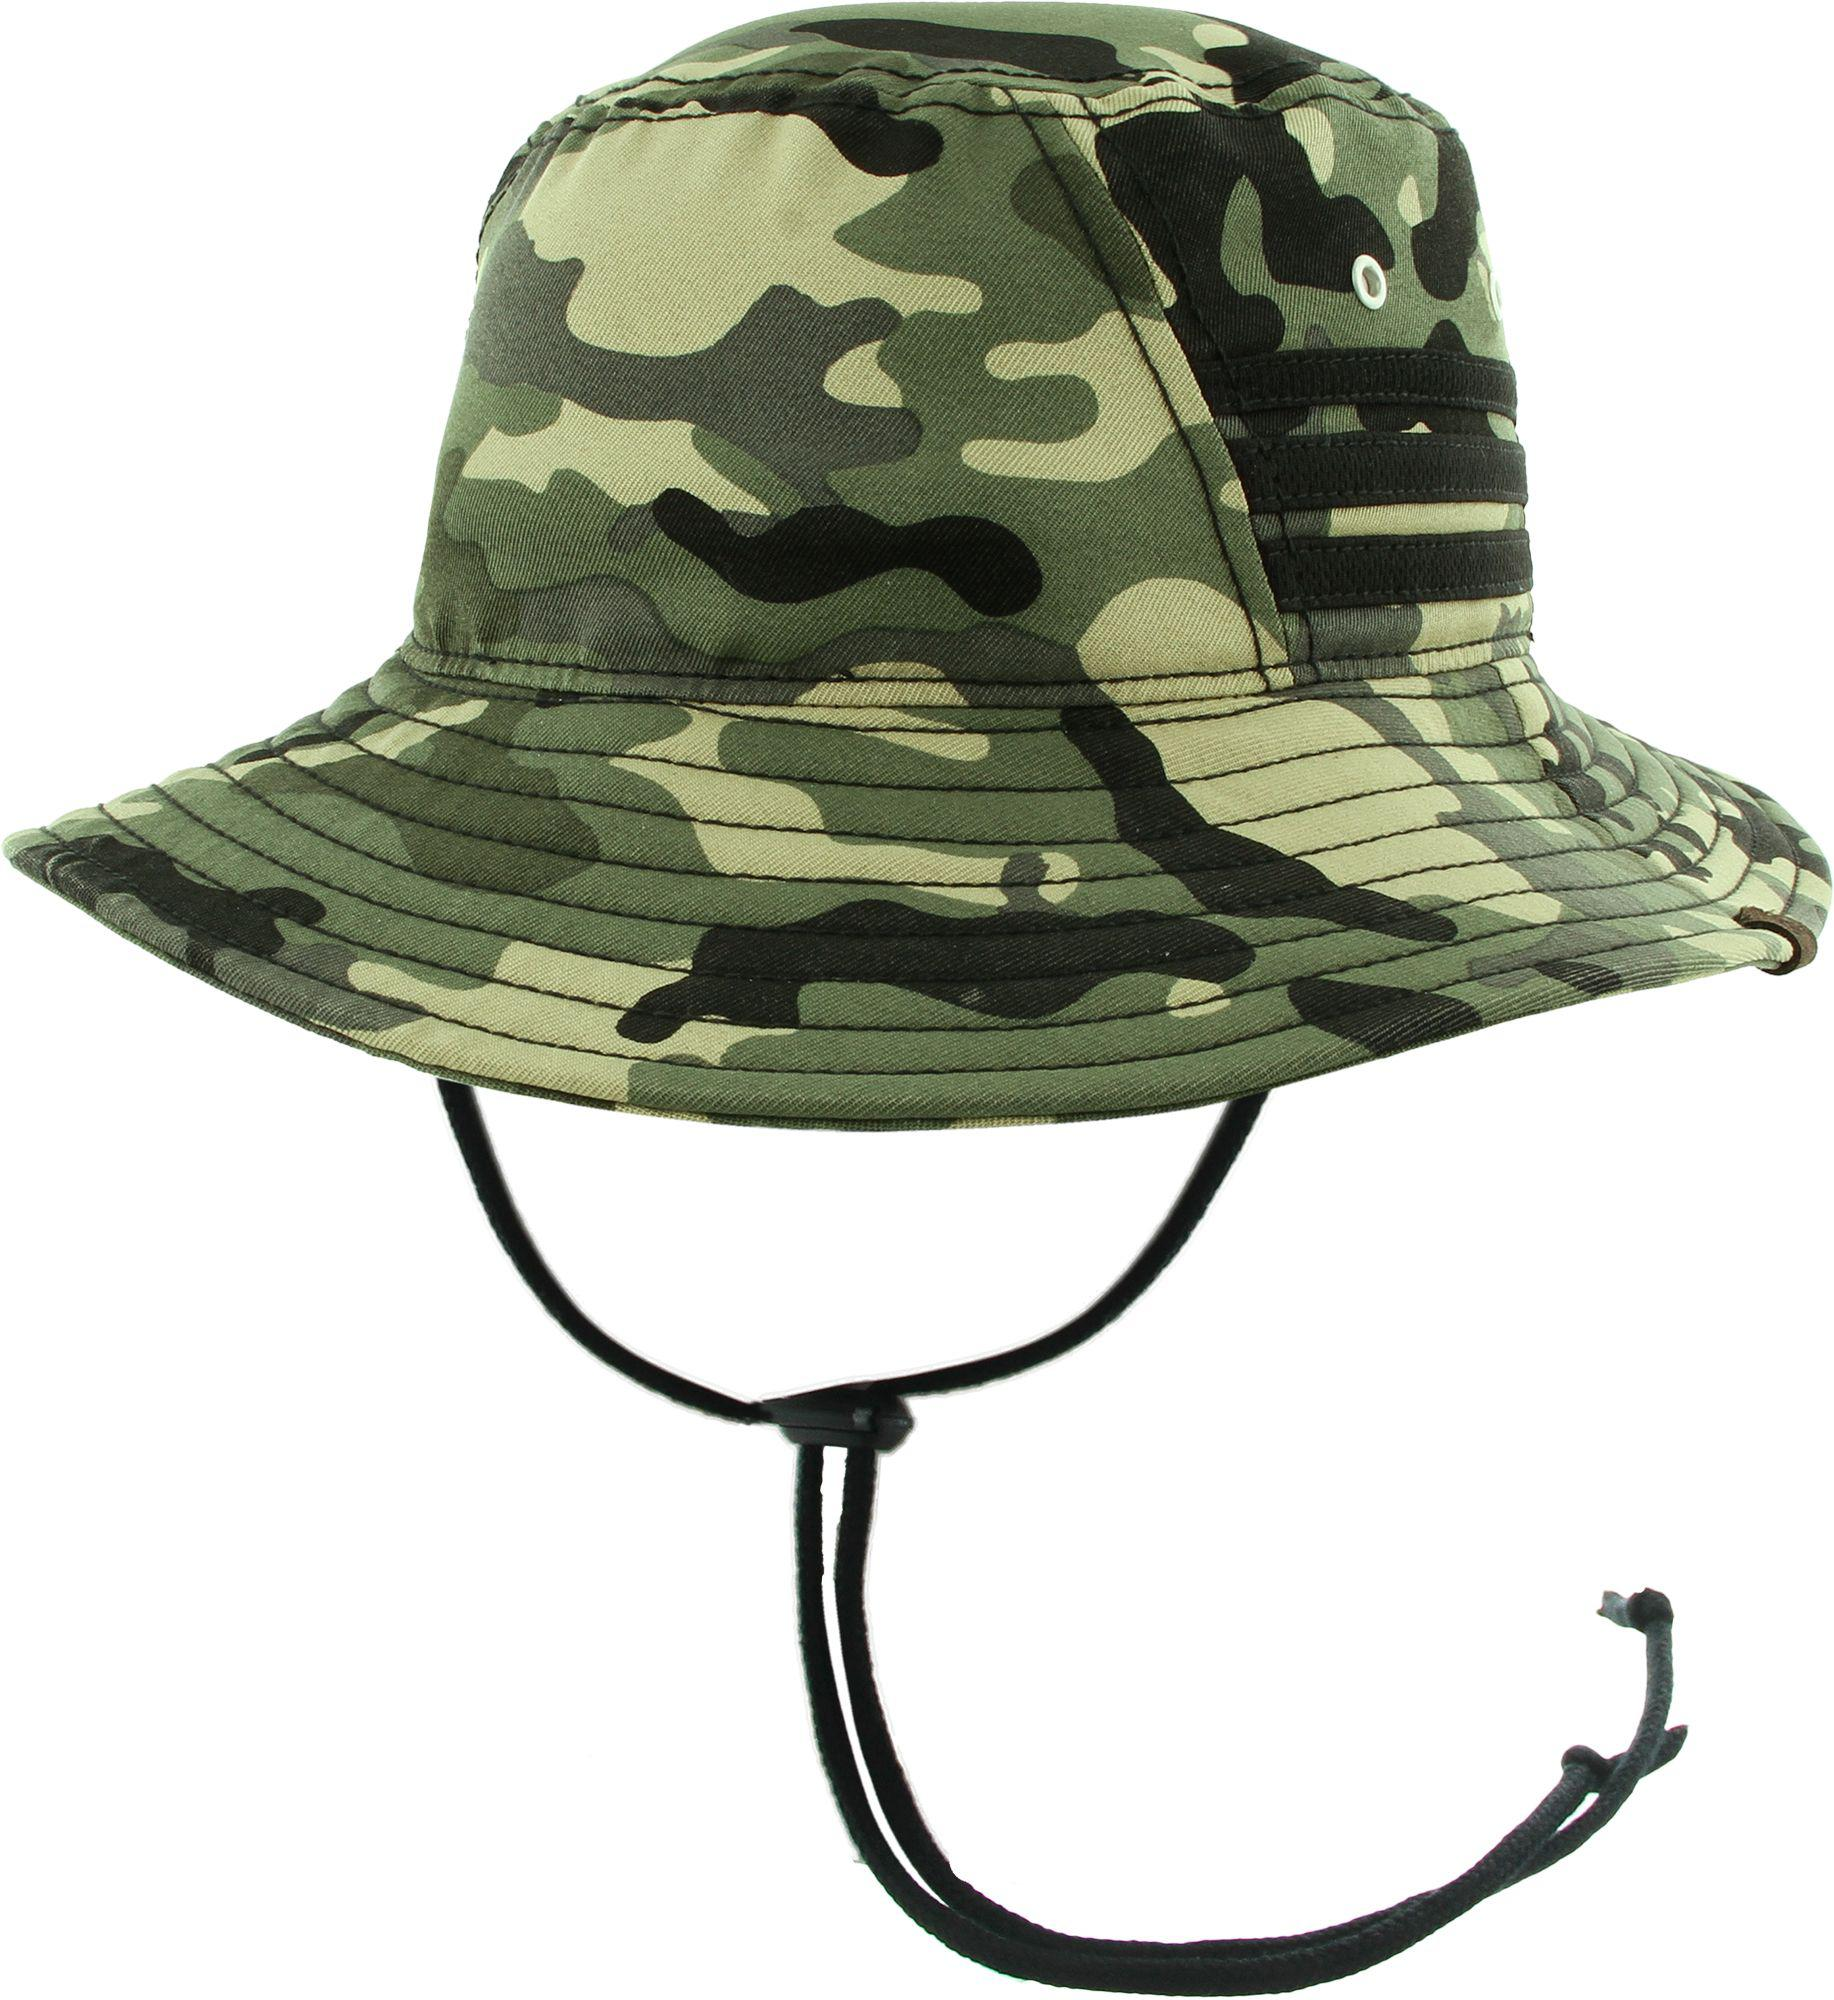 c0abc0c50c6ec adidas Victory Bucket Hat in Green for Men - Lyst